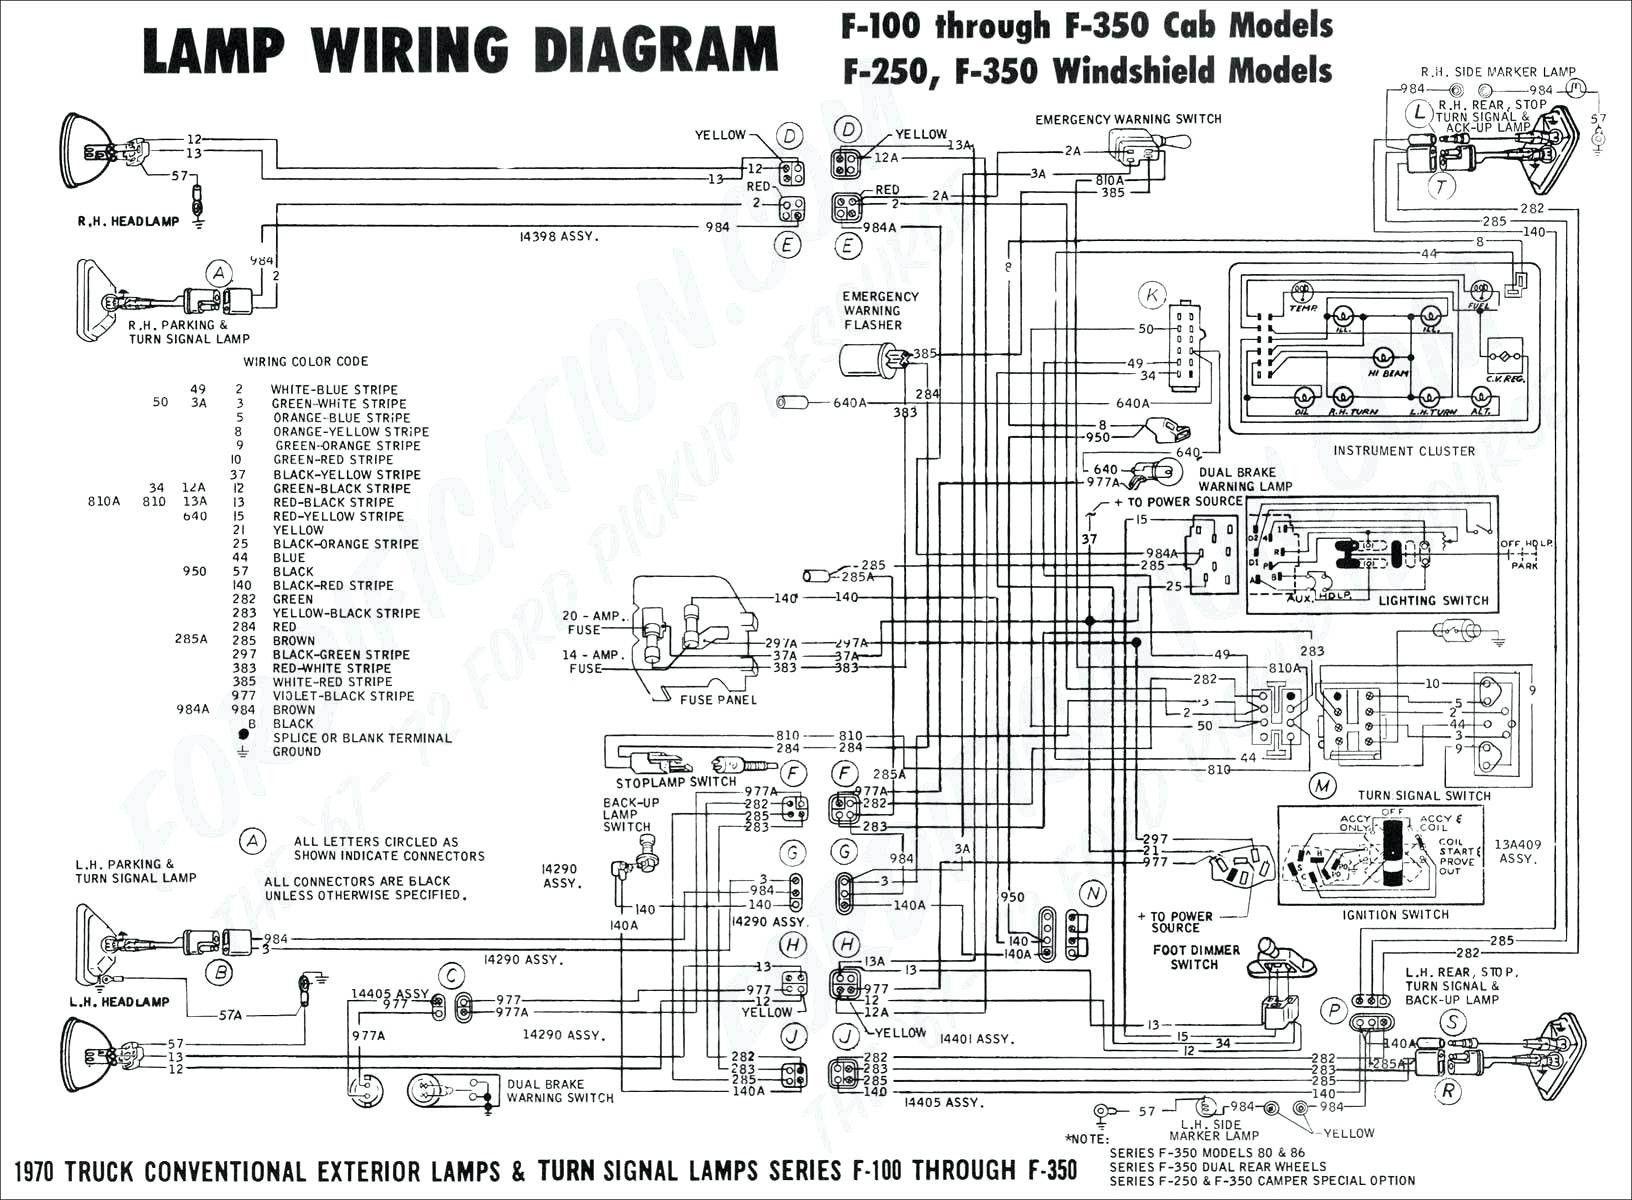 7 3 Powerstroke Wiring Diagram Inspirational In 2020 Electrical Wiring Diagram Diagram Trailer Wiring Diagram